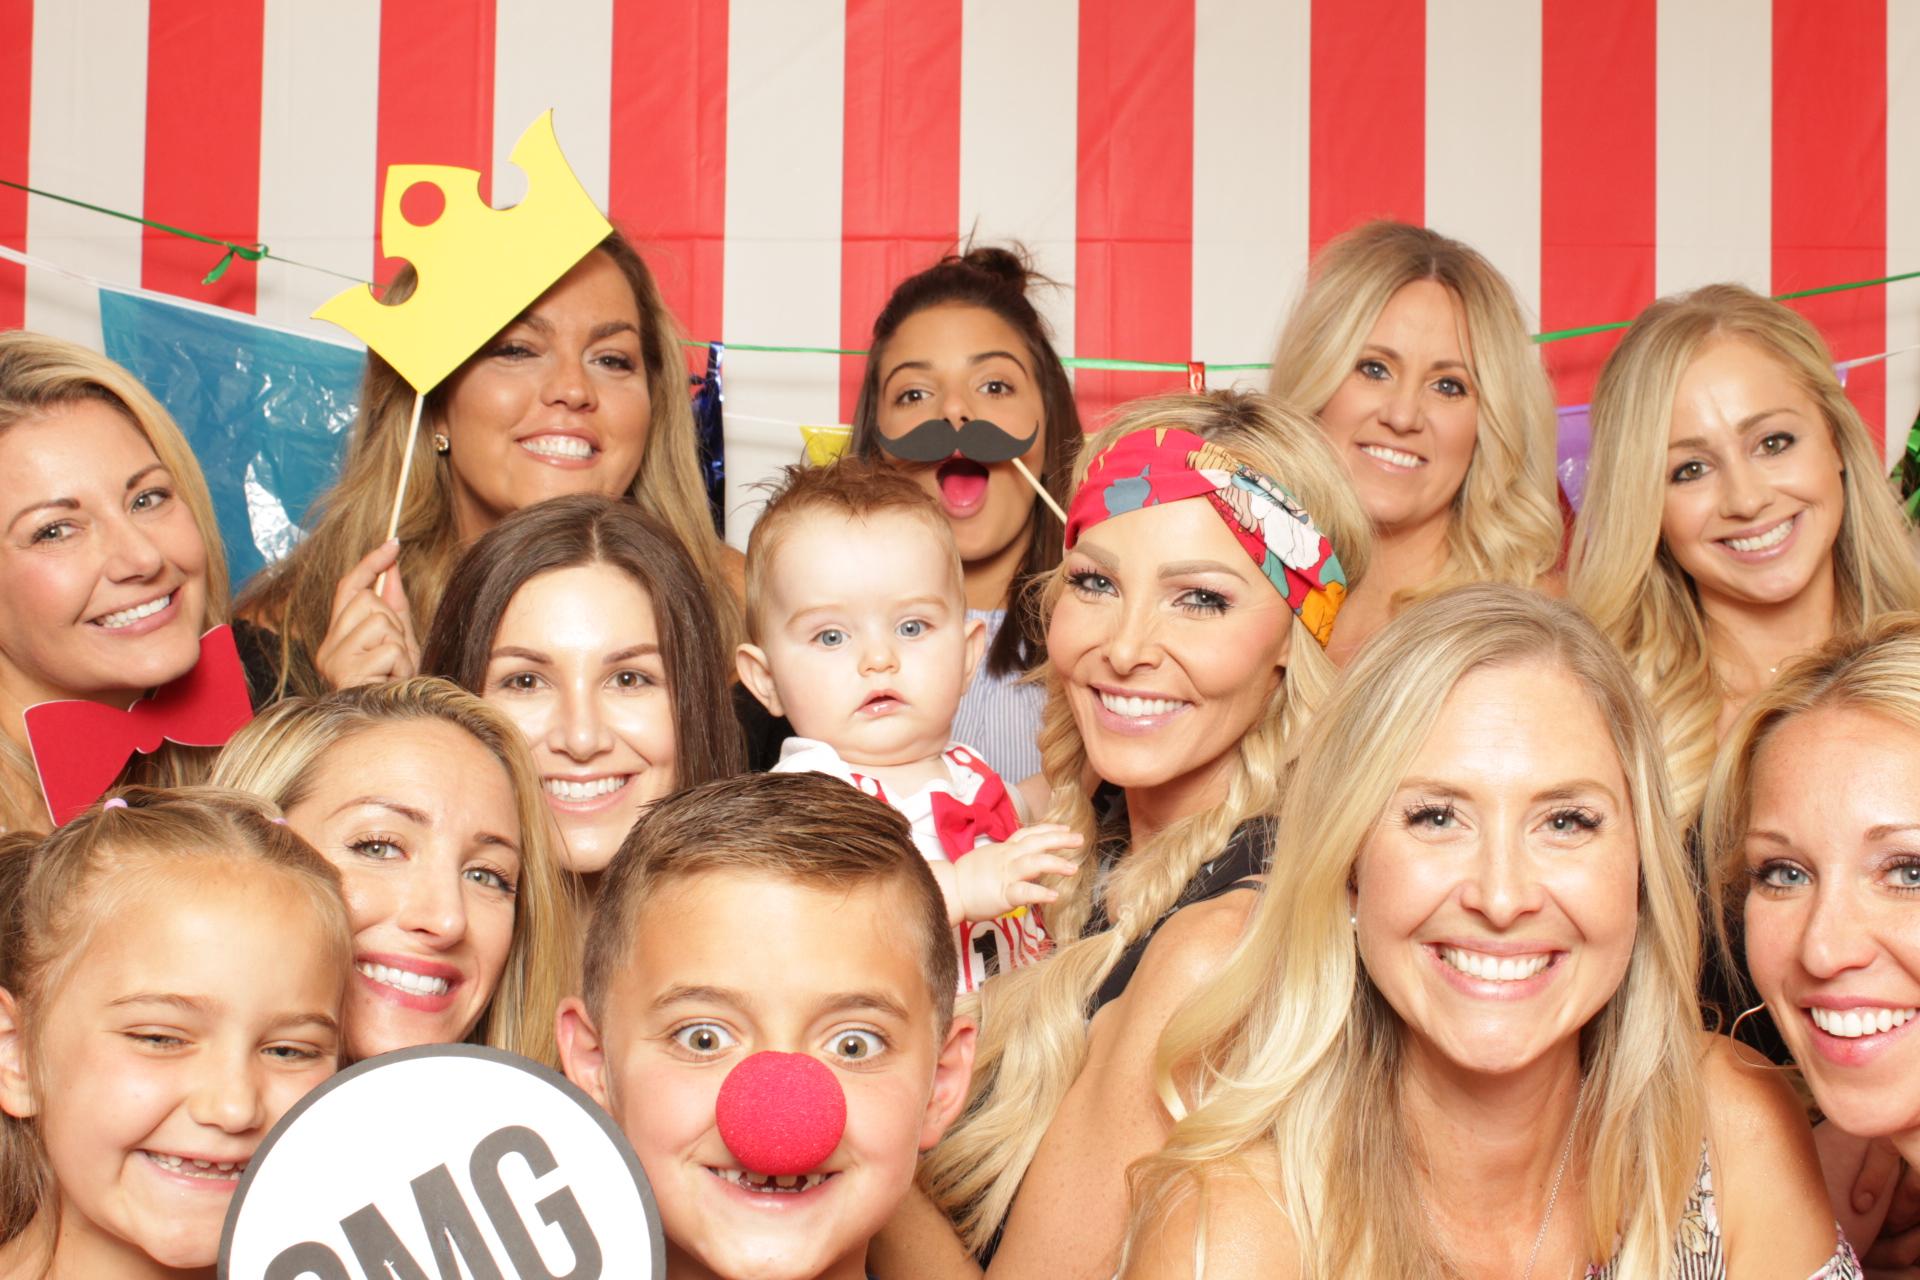 Easton's 1st Birthday Circus - Chandler, AZ06/09/2018